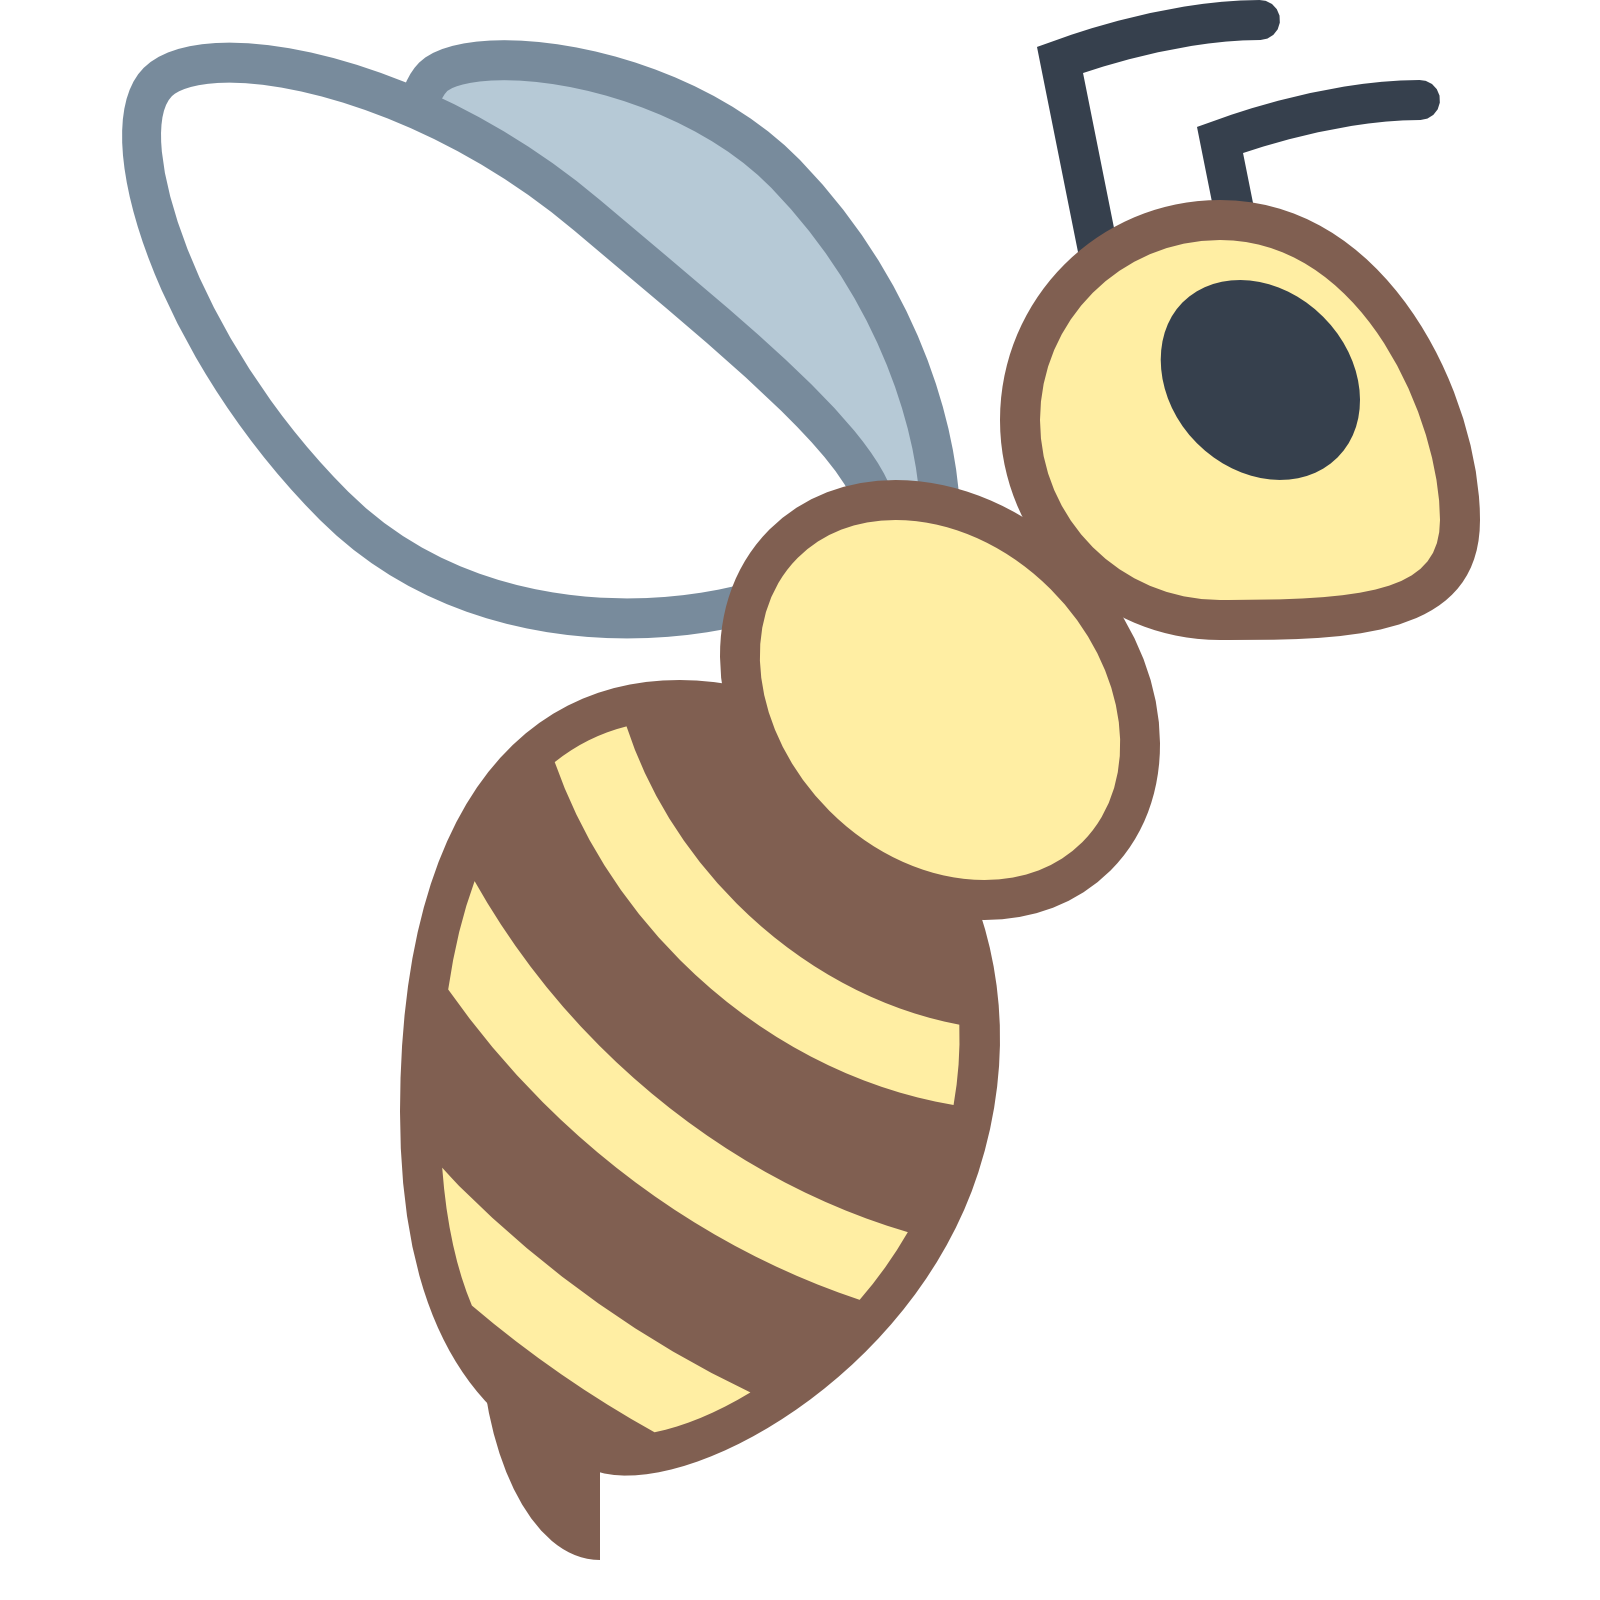 Free PNG Honey Bee - 47267